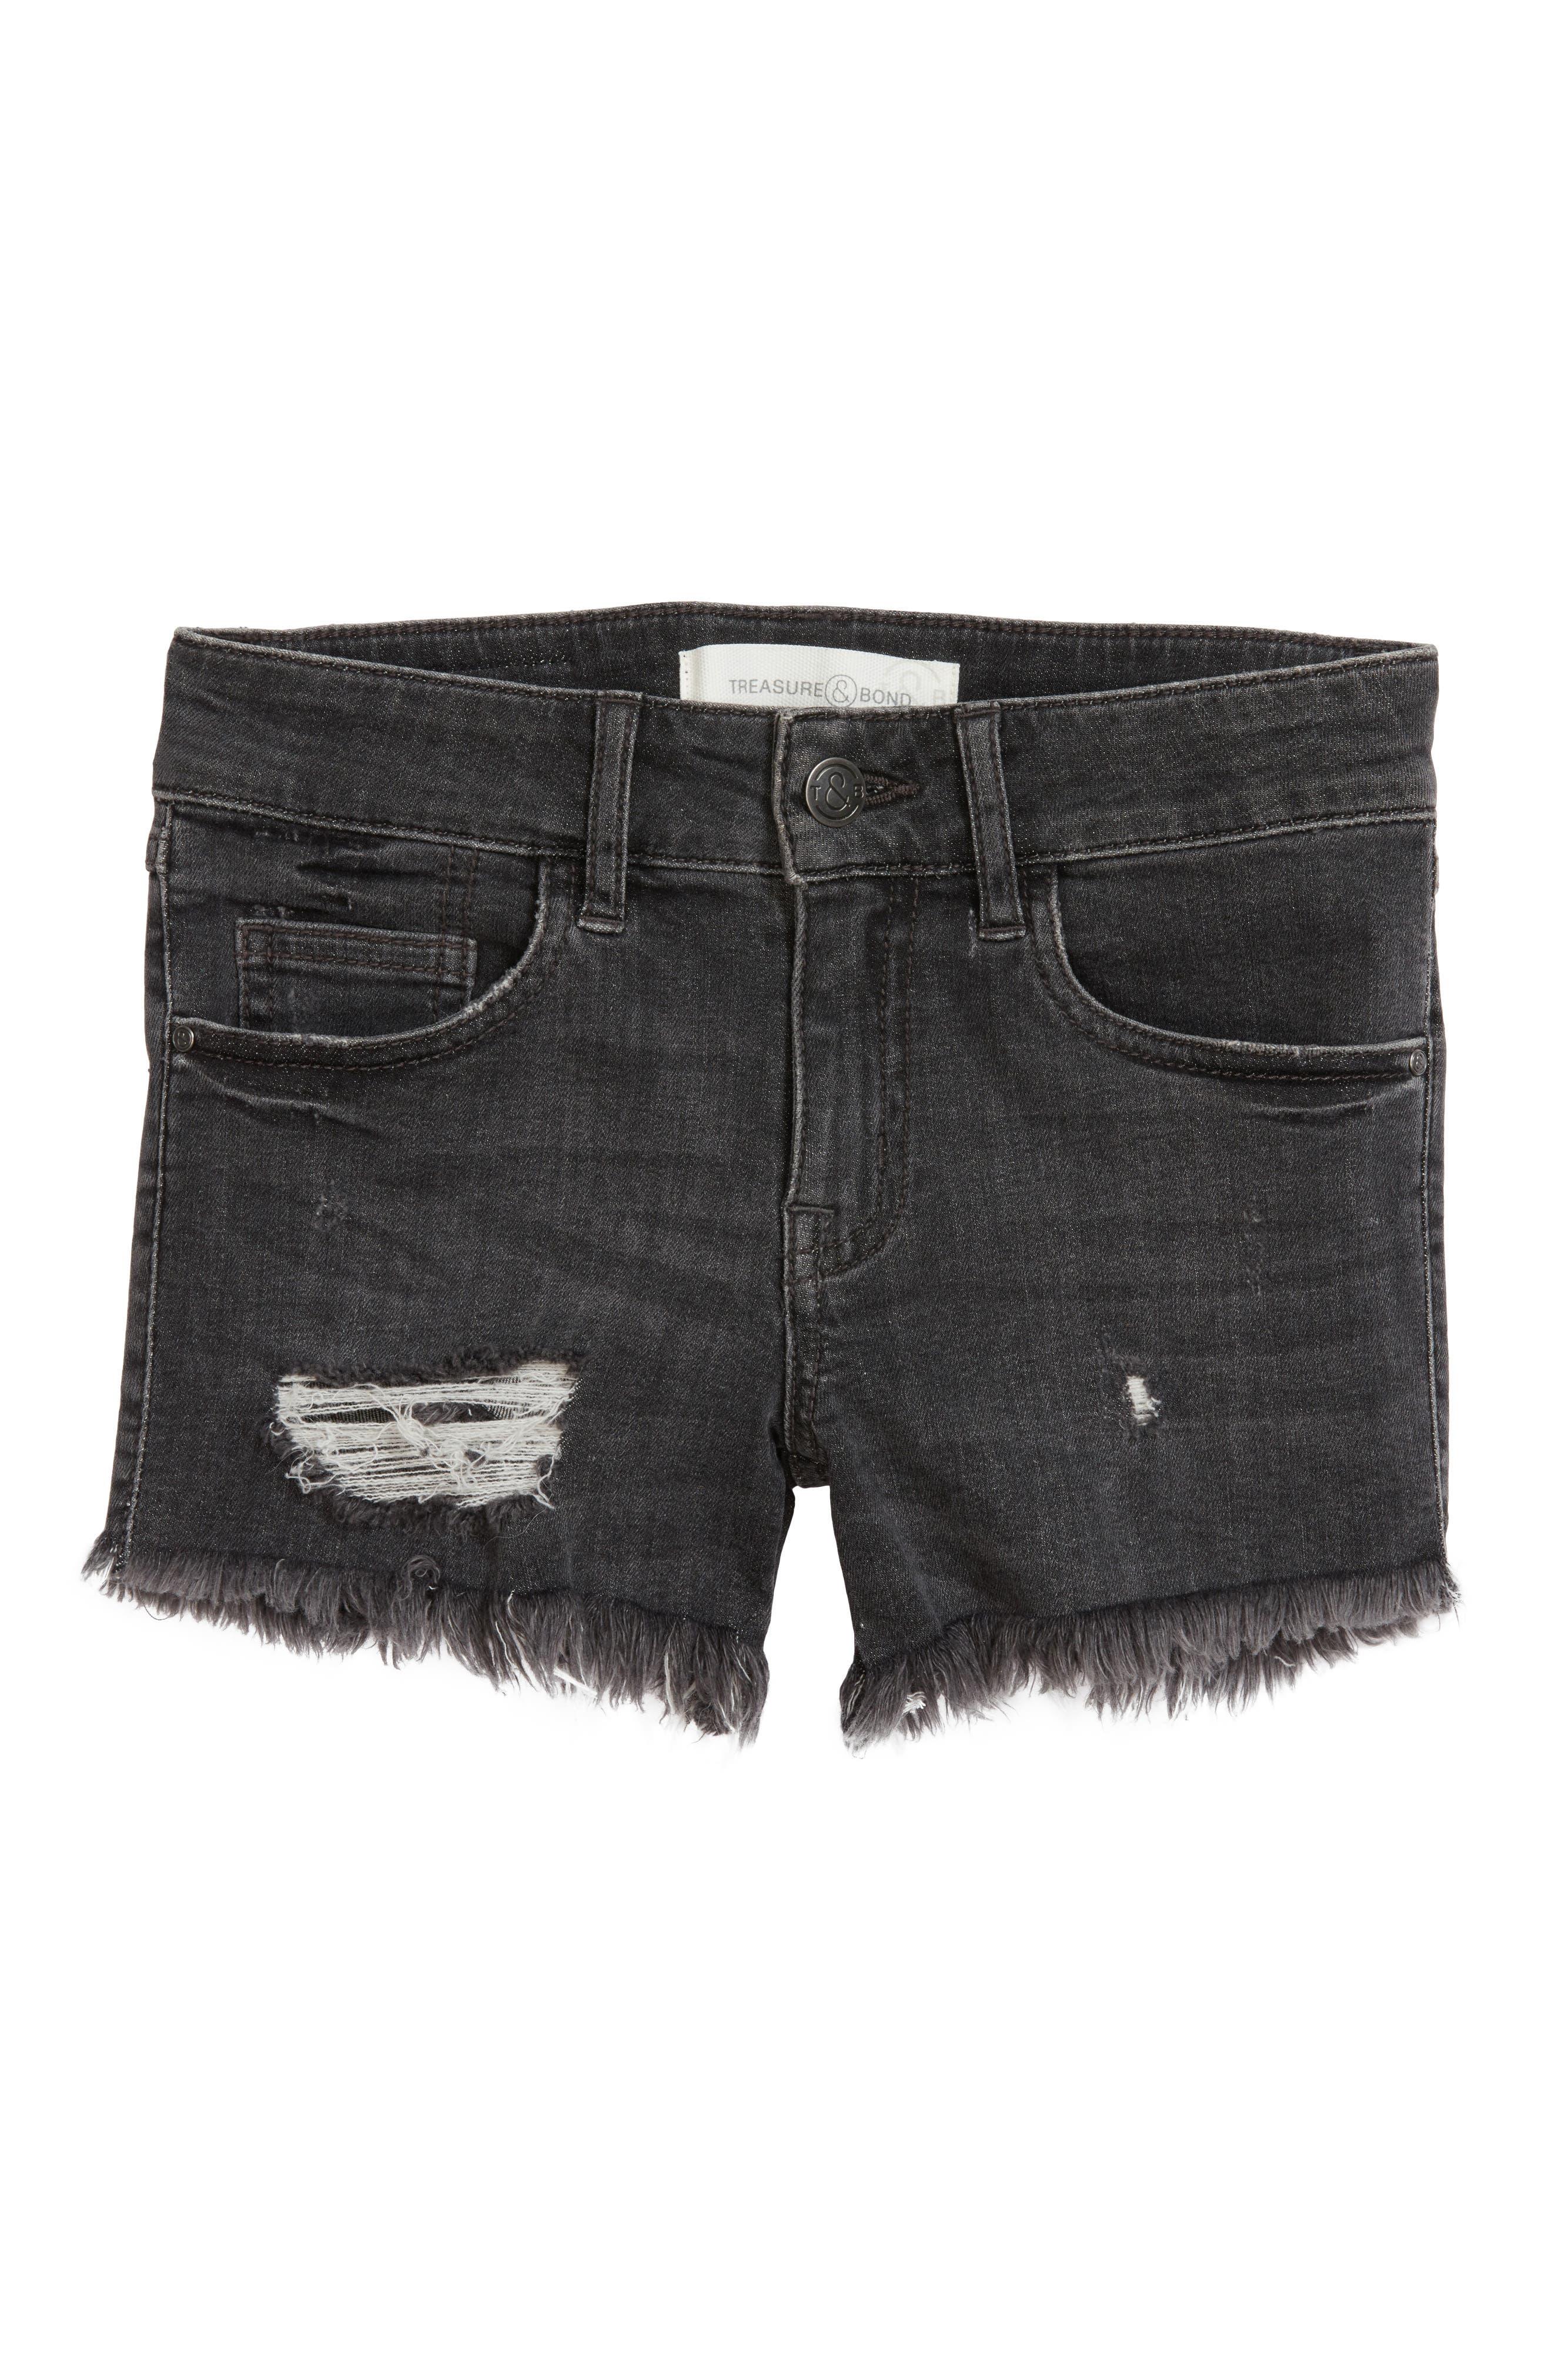 Treasure & Bond Distressed Cutoff Denim Shorts (Big Girls)